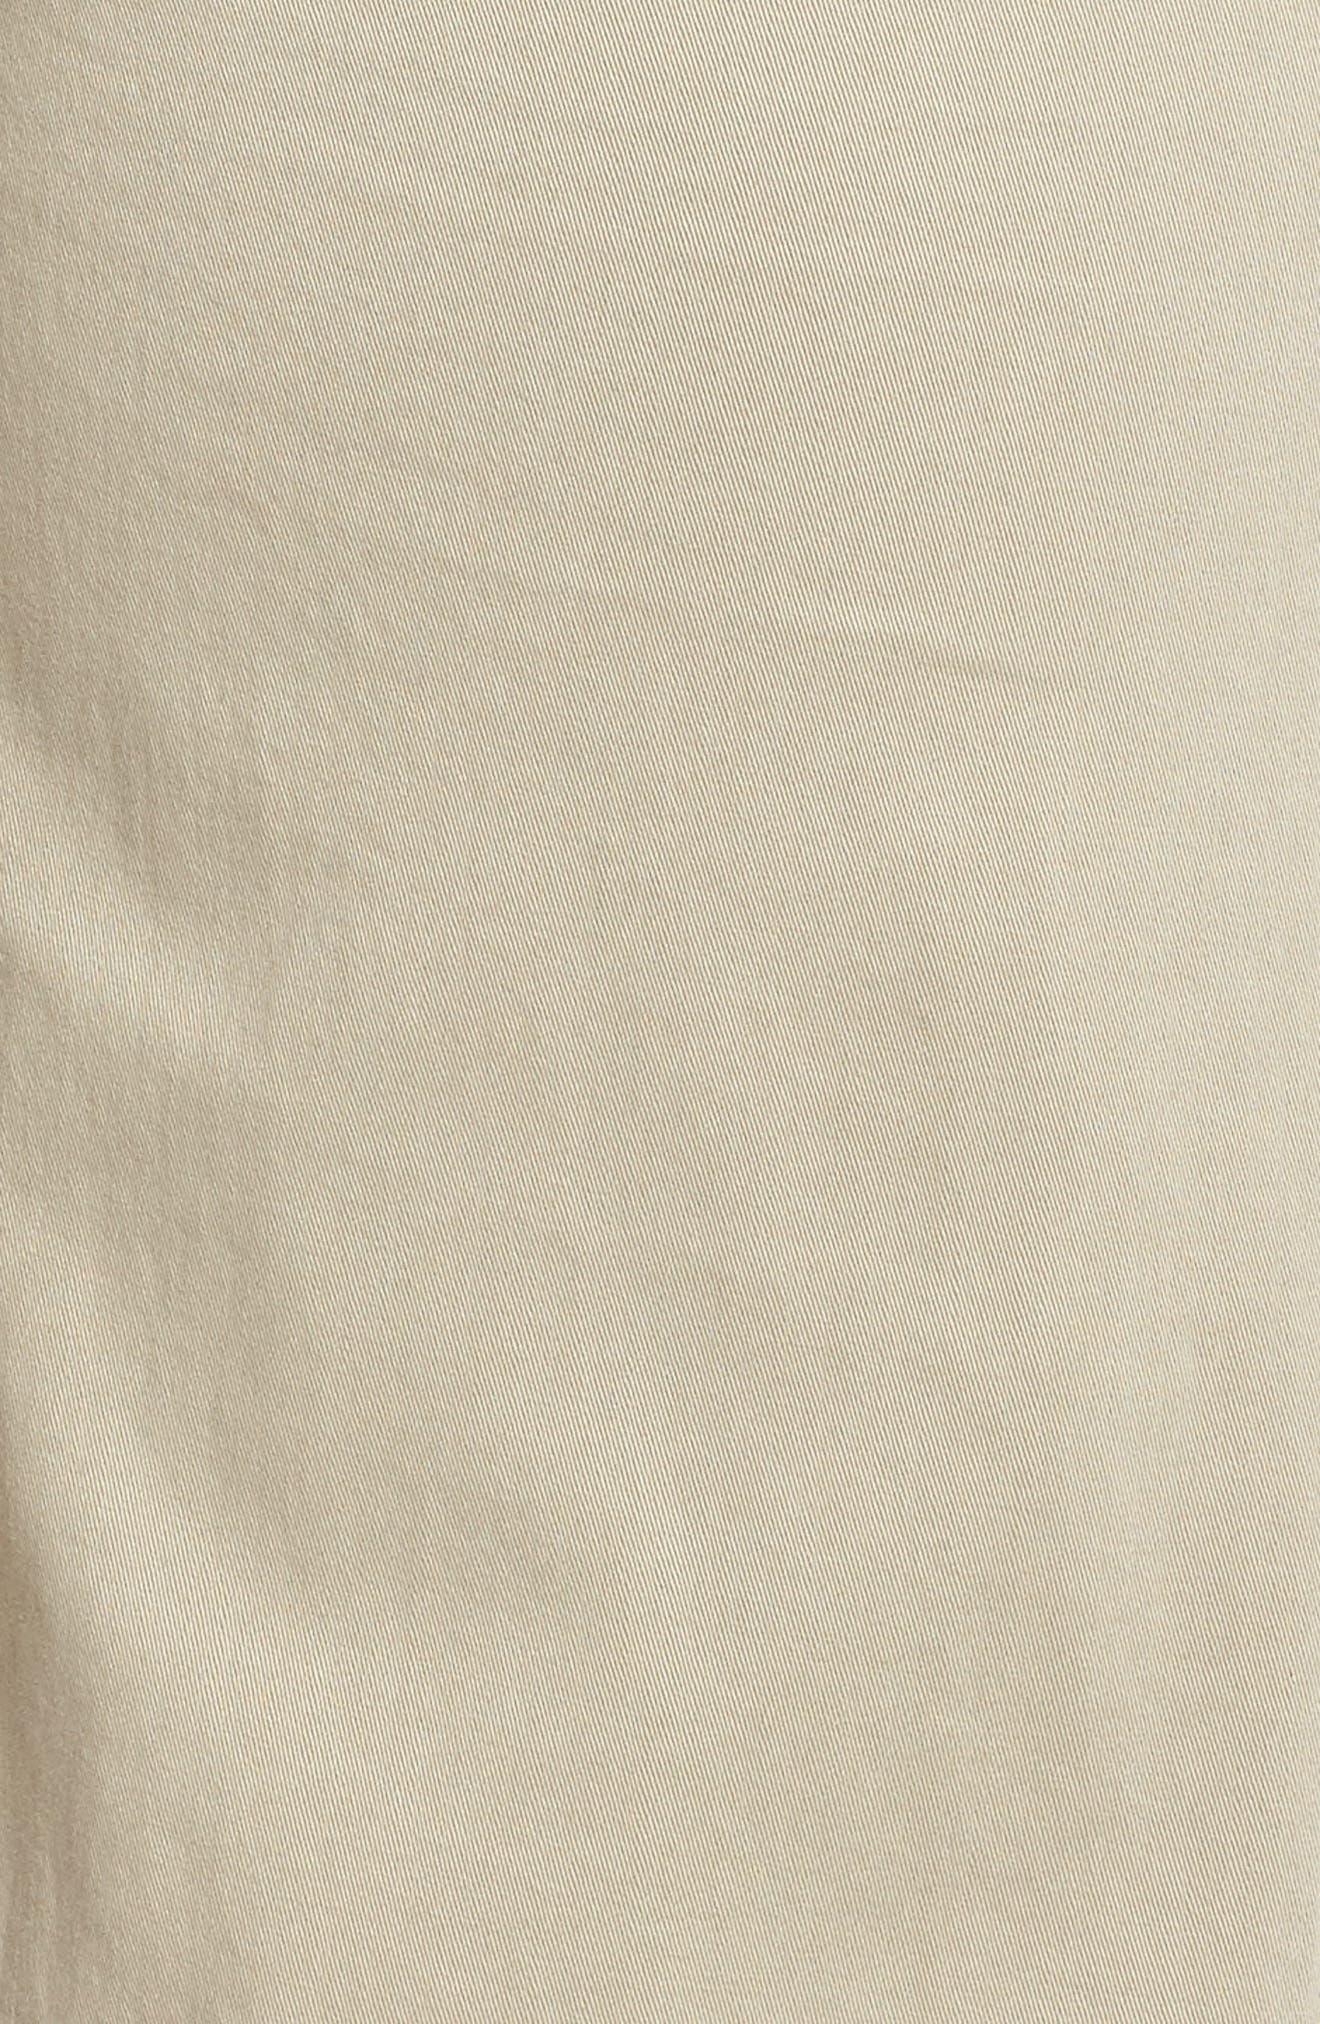 Wide Leg Stretch Cotton Twill Crop Pants,                             Alternate thumbnail 6, color,                             Tan Cobblestone